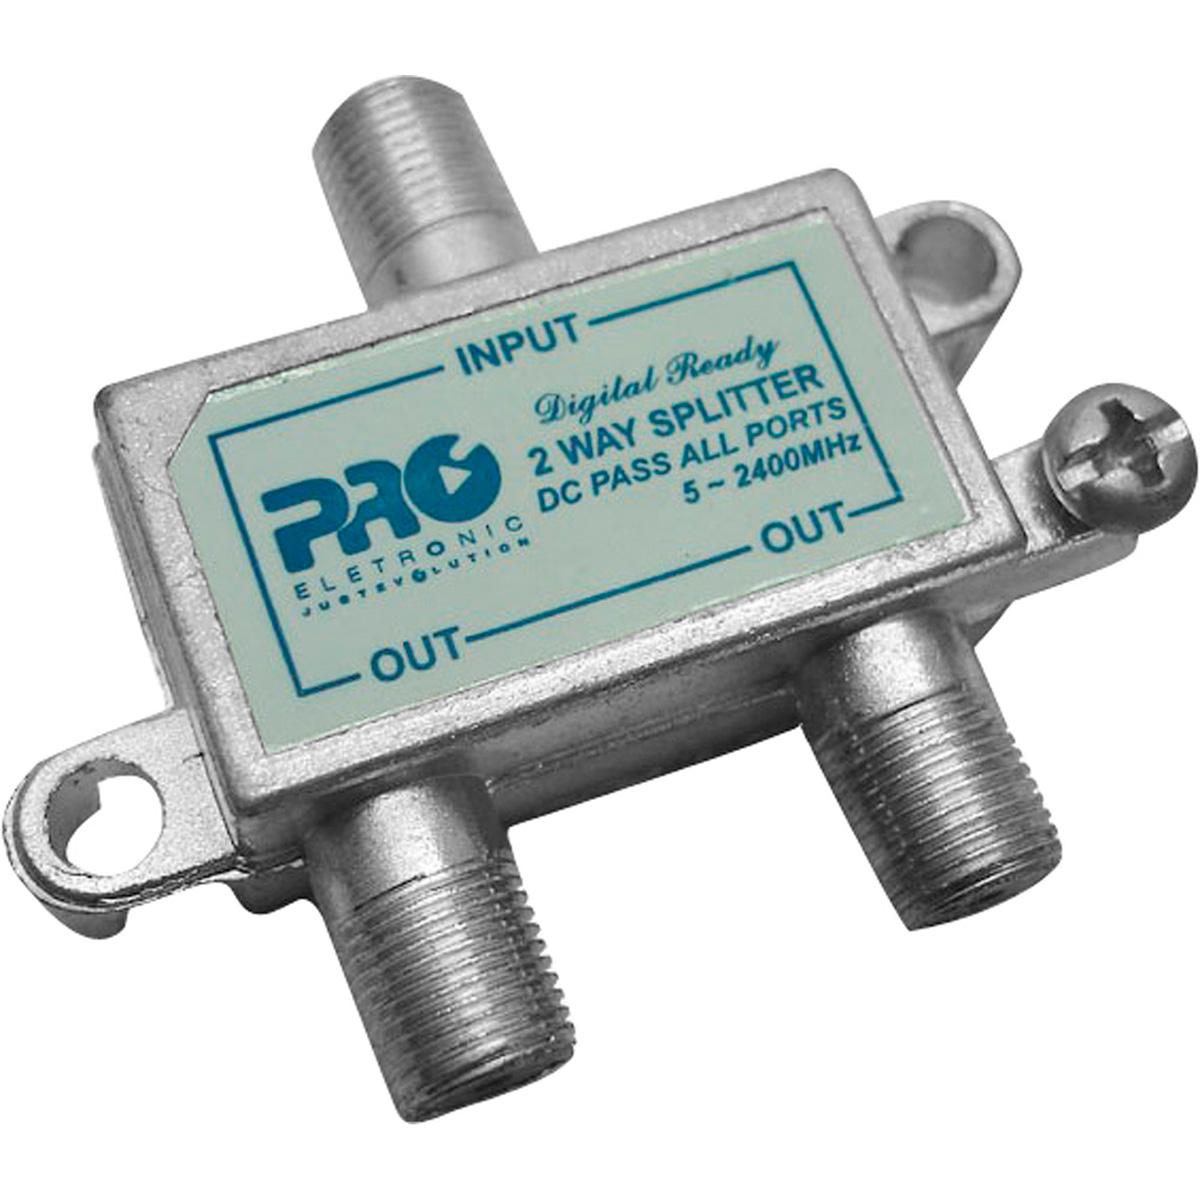 PQVD1022 - Divisor 1:2 CATV 1GHz (25unid) PQVD 1022 - ProEletronic